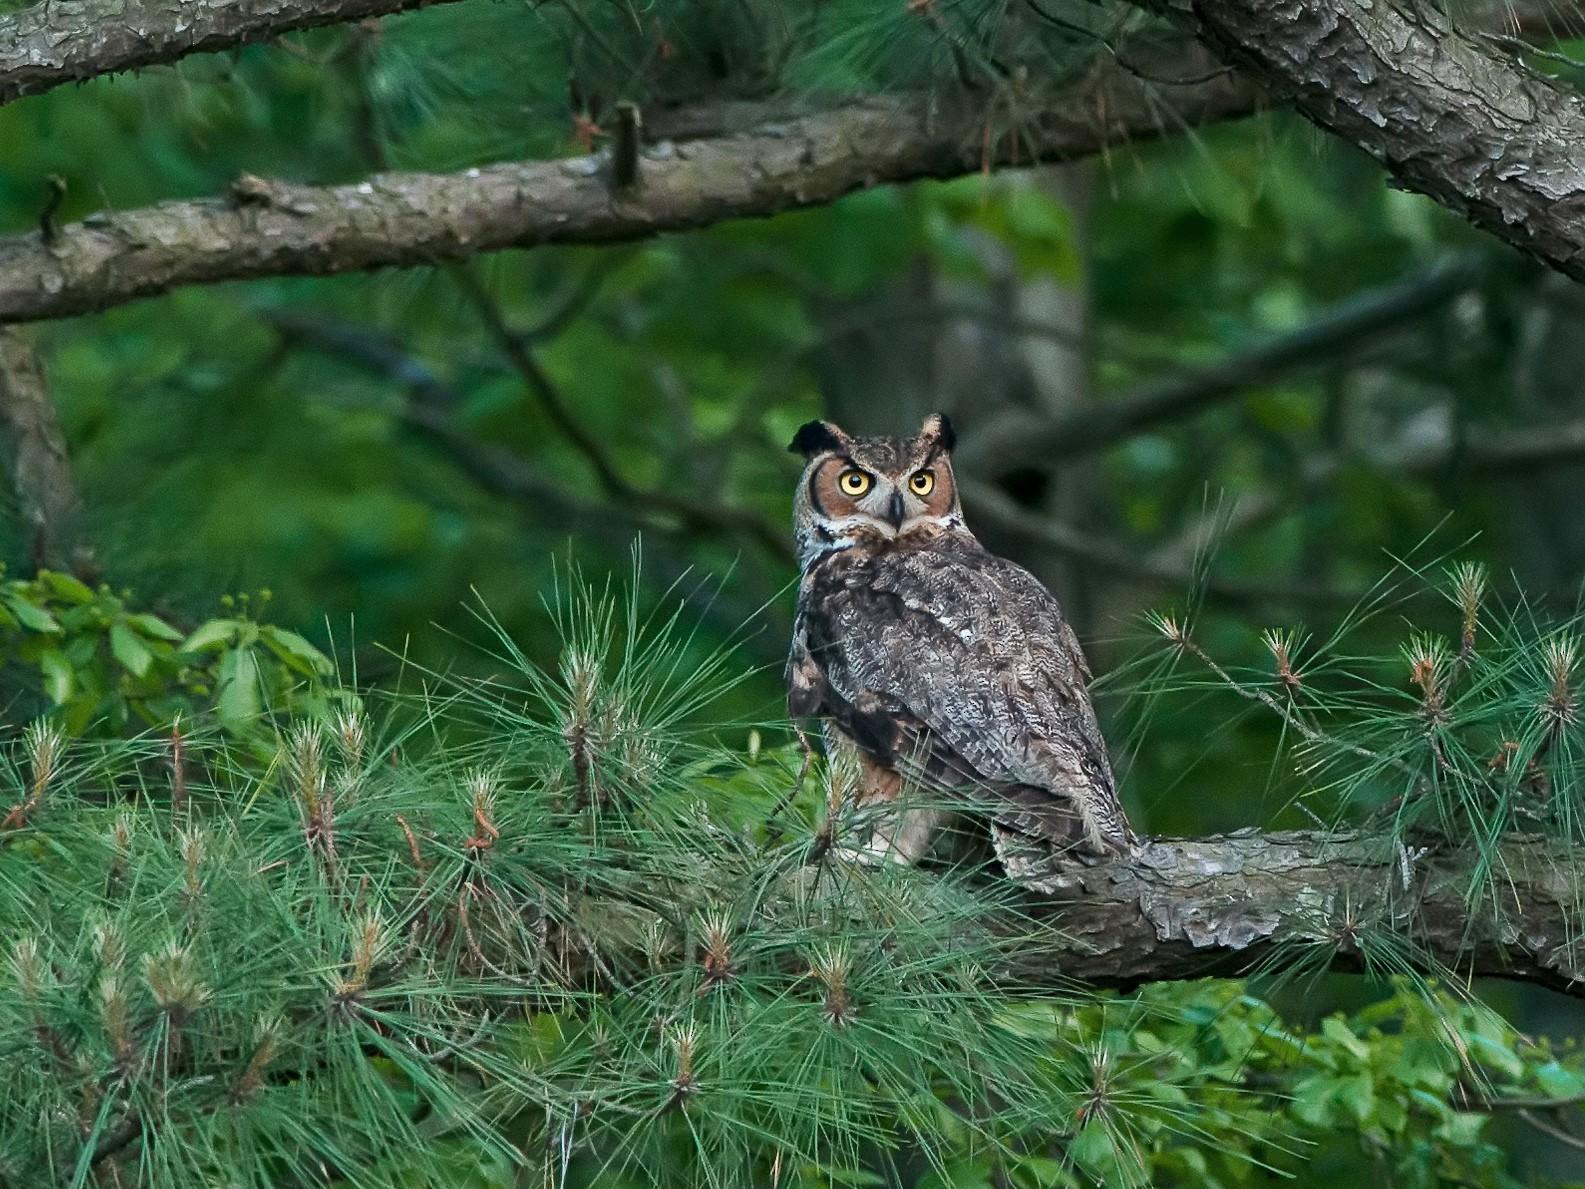 Great Horned Owl - Marty DeAngelo